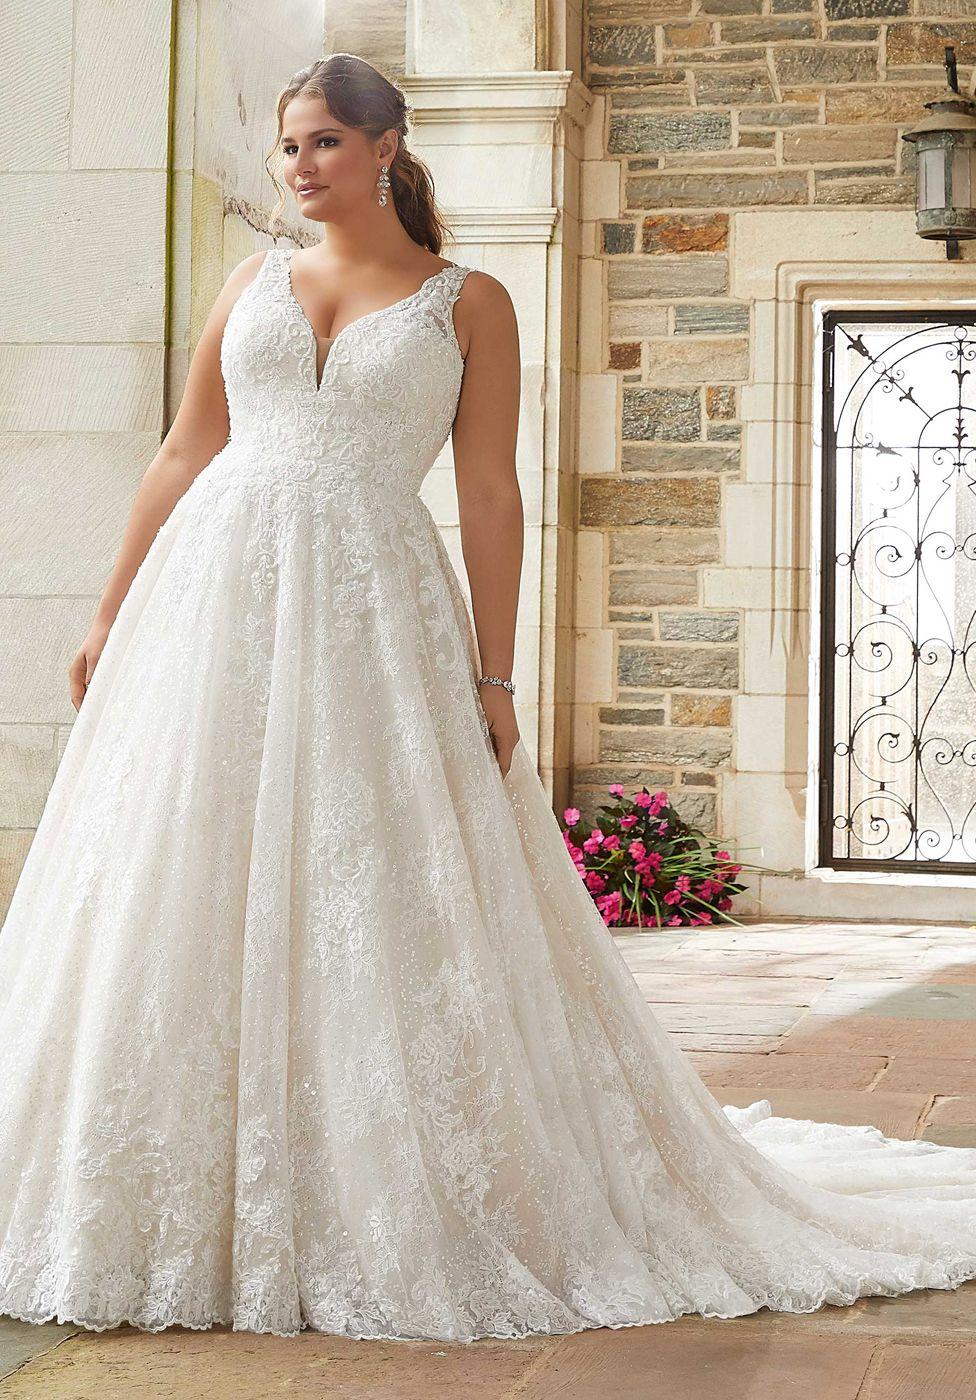 Mori Lee 3290 Selene Lace Up Back Plus Size Bridal Gown Plus Size Wedding Gowns Wedding Dress Inspiration Ball Gown Wedding Dress [ 1400 x 976 Pixel ]